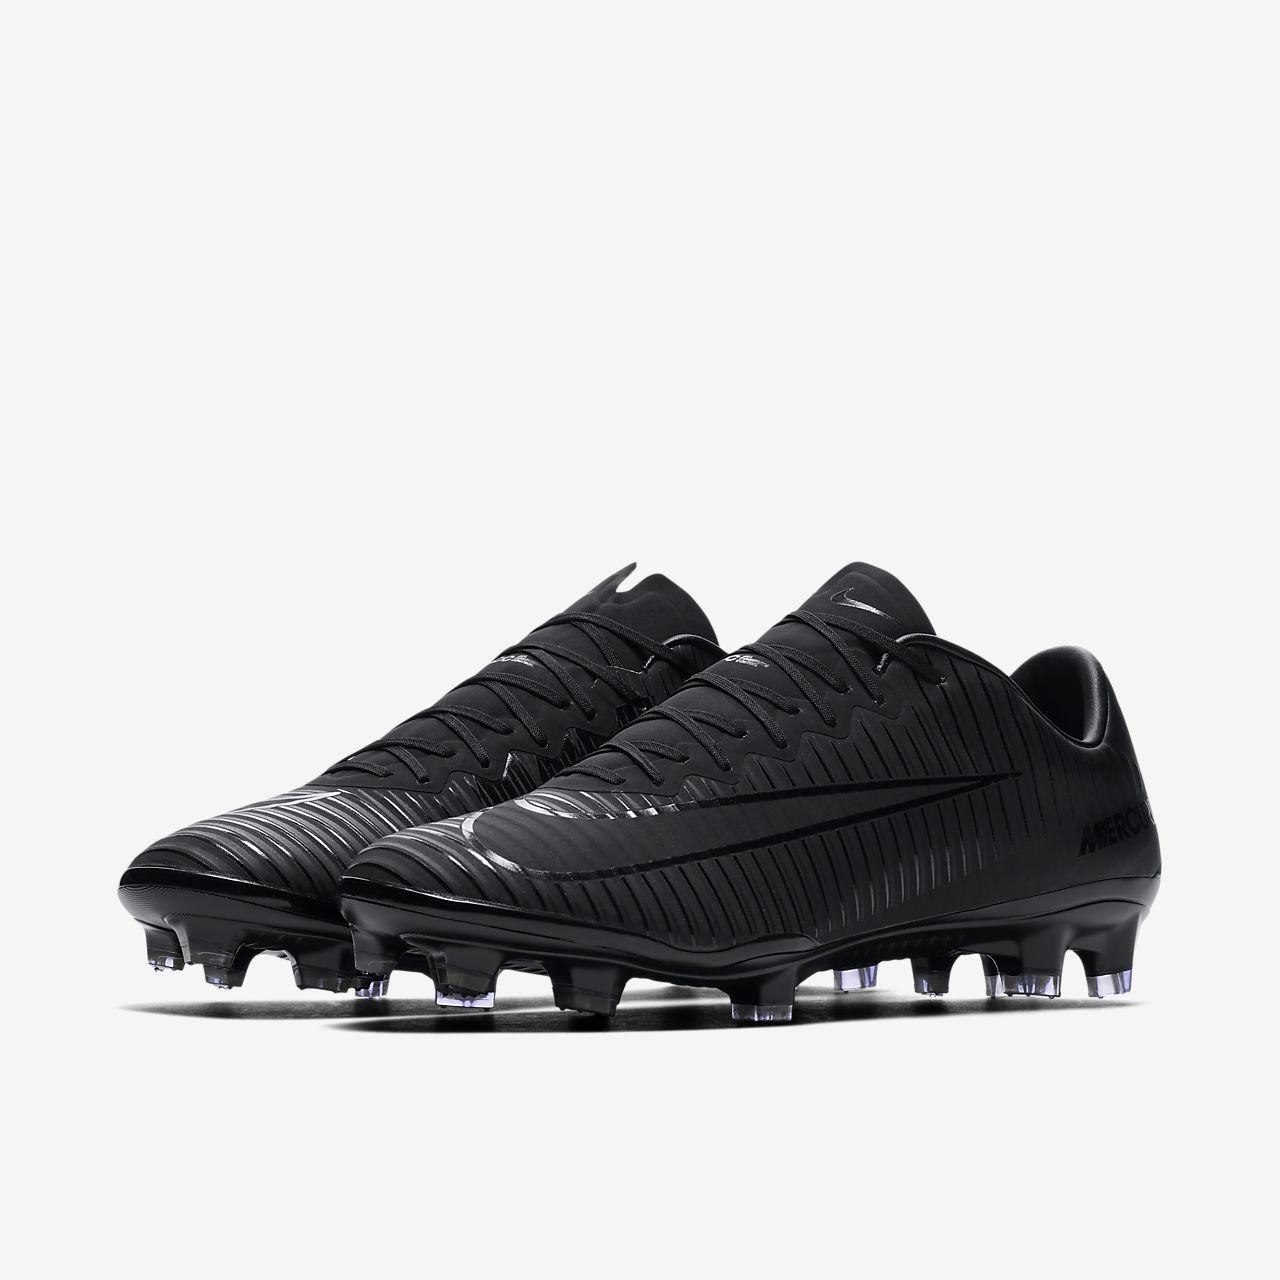 ... black white hyper turq mens soccer shoes soft spike football footw; nike  mercurial vapor xi firm ground football boot